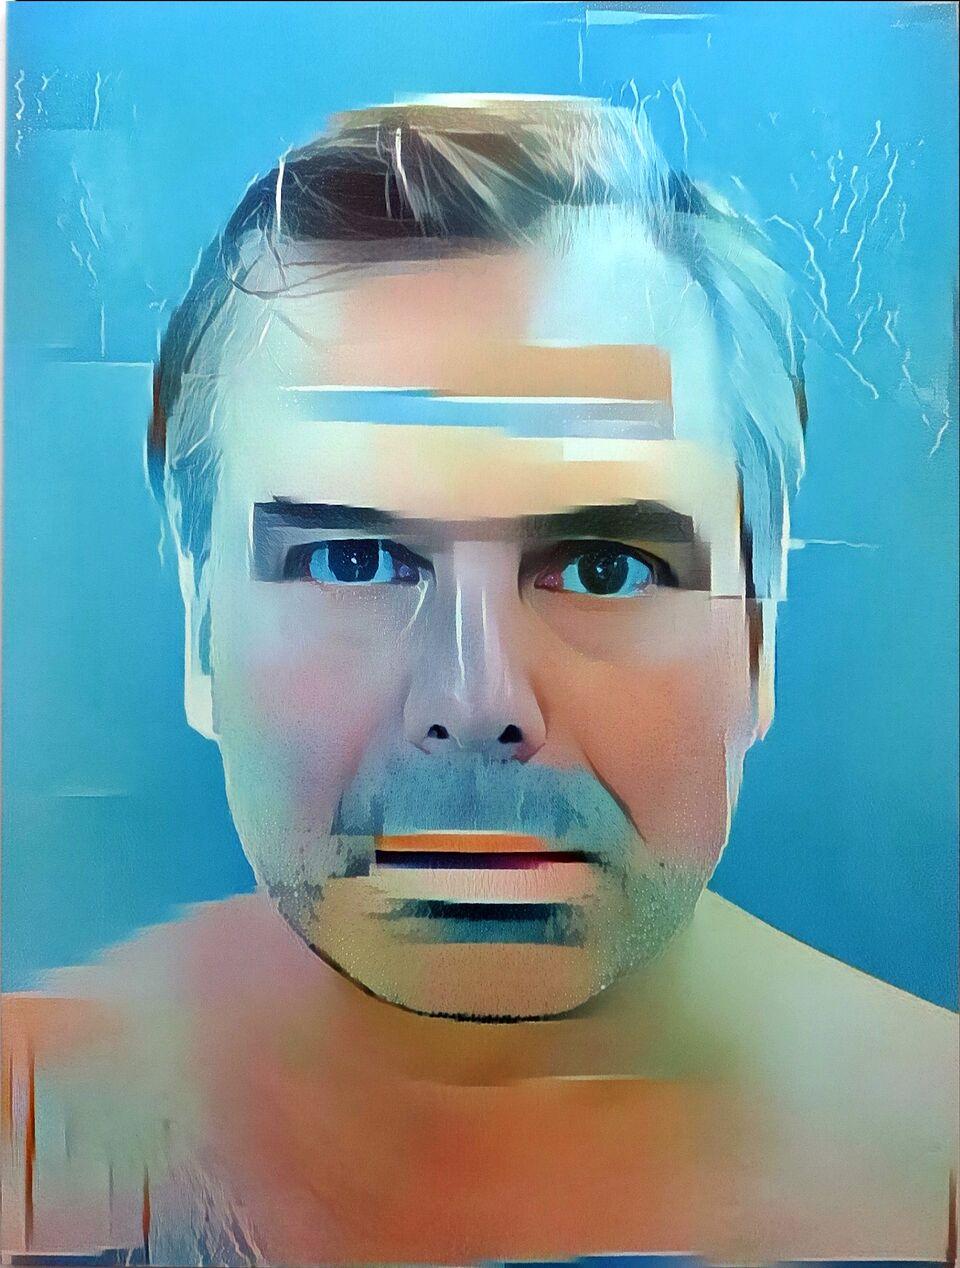 Artificial Intelligence Style Transfer Self-Portrait (David Hockney & My Face)